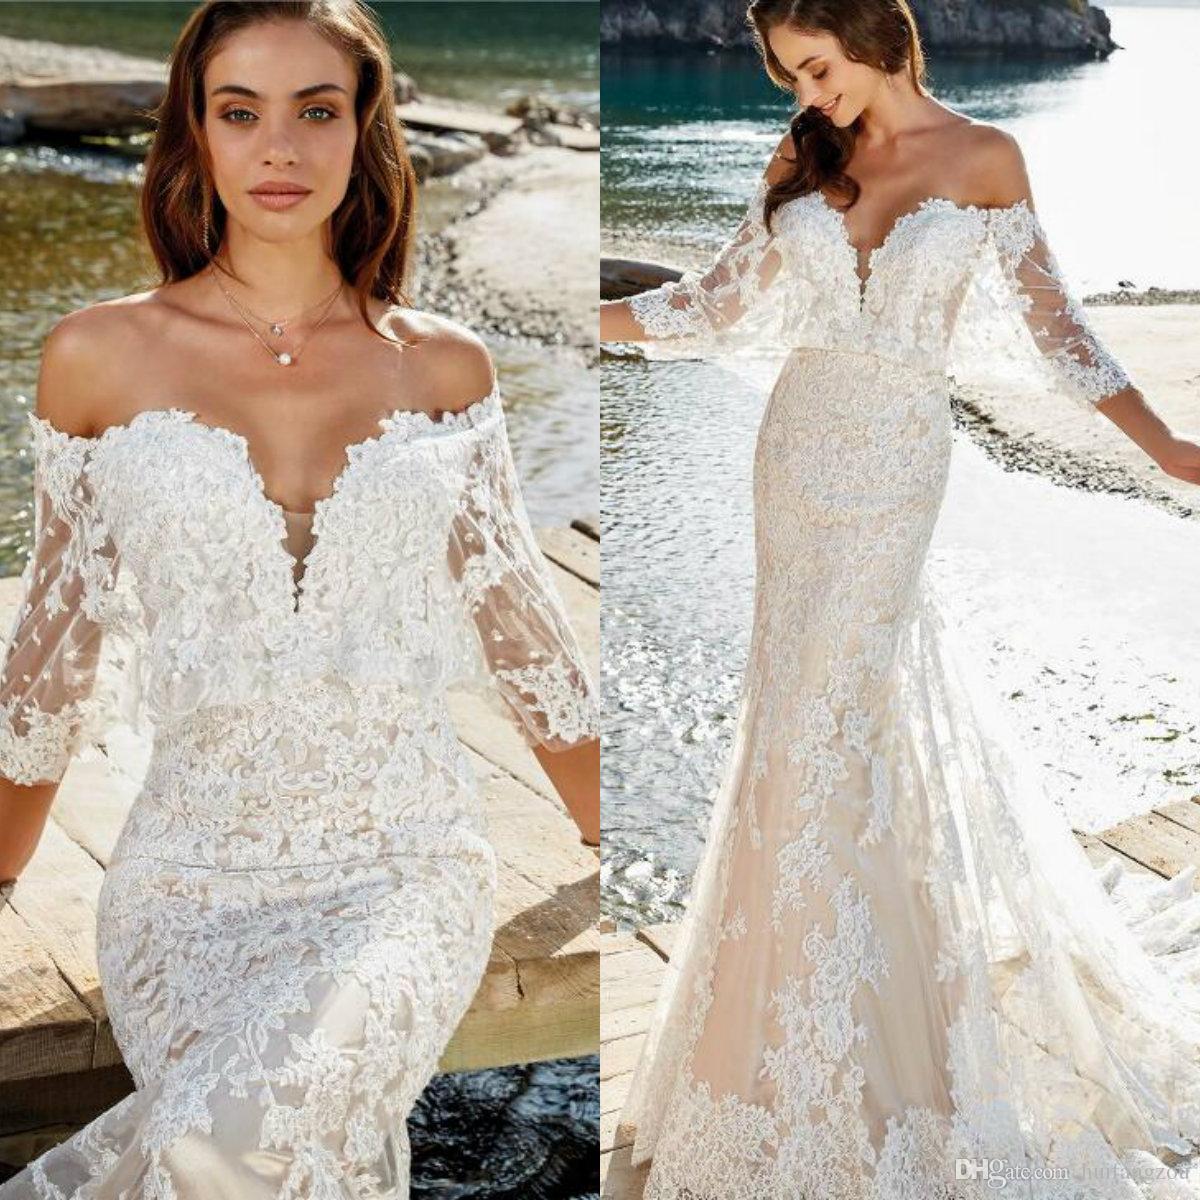 8f78e3097bf6 Eddy K. Dreams 2019 Wedding Dress Off Shoulder Lace Half Sleeve Appliques  Mermaid Wedding Dresses Customized Beach Bridal Gowns Plus Size Formal  Dresses Tea ...